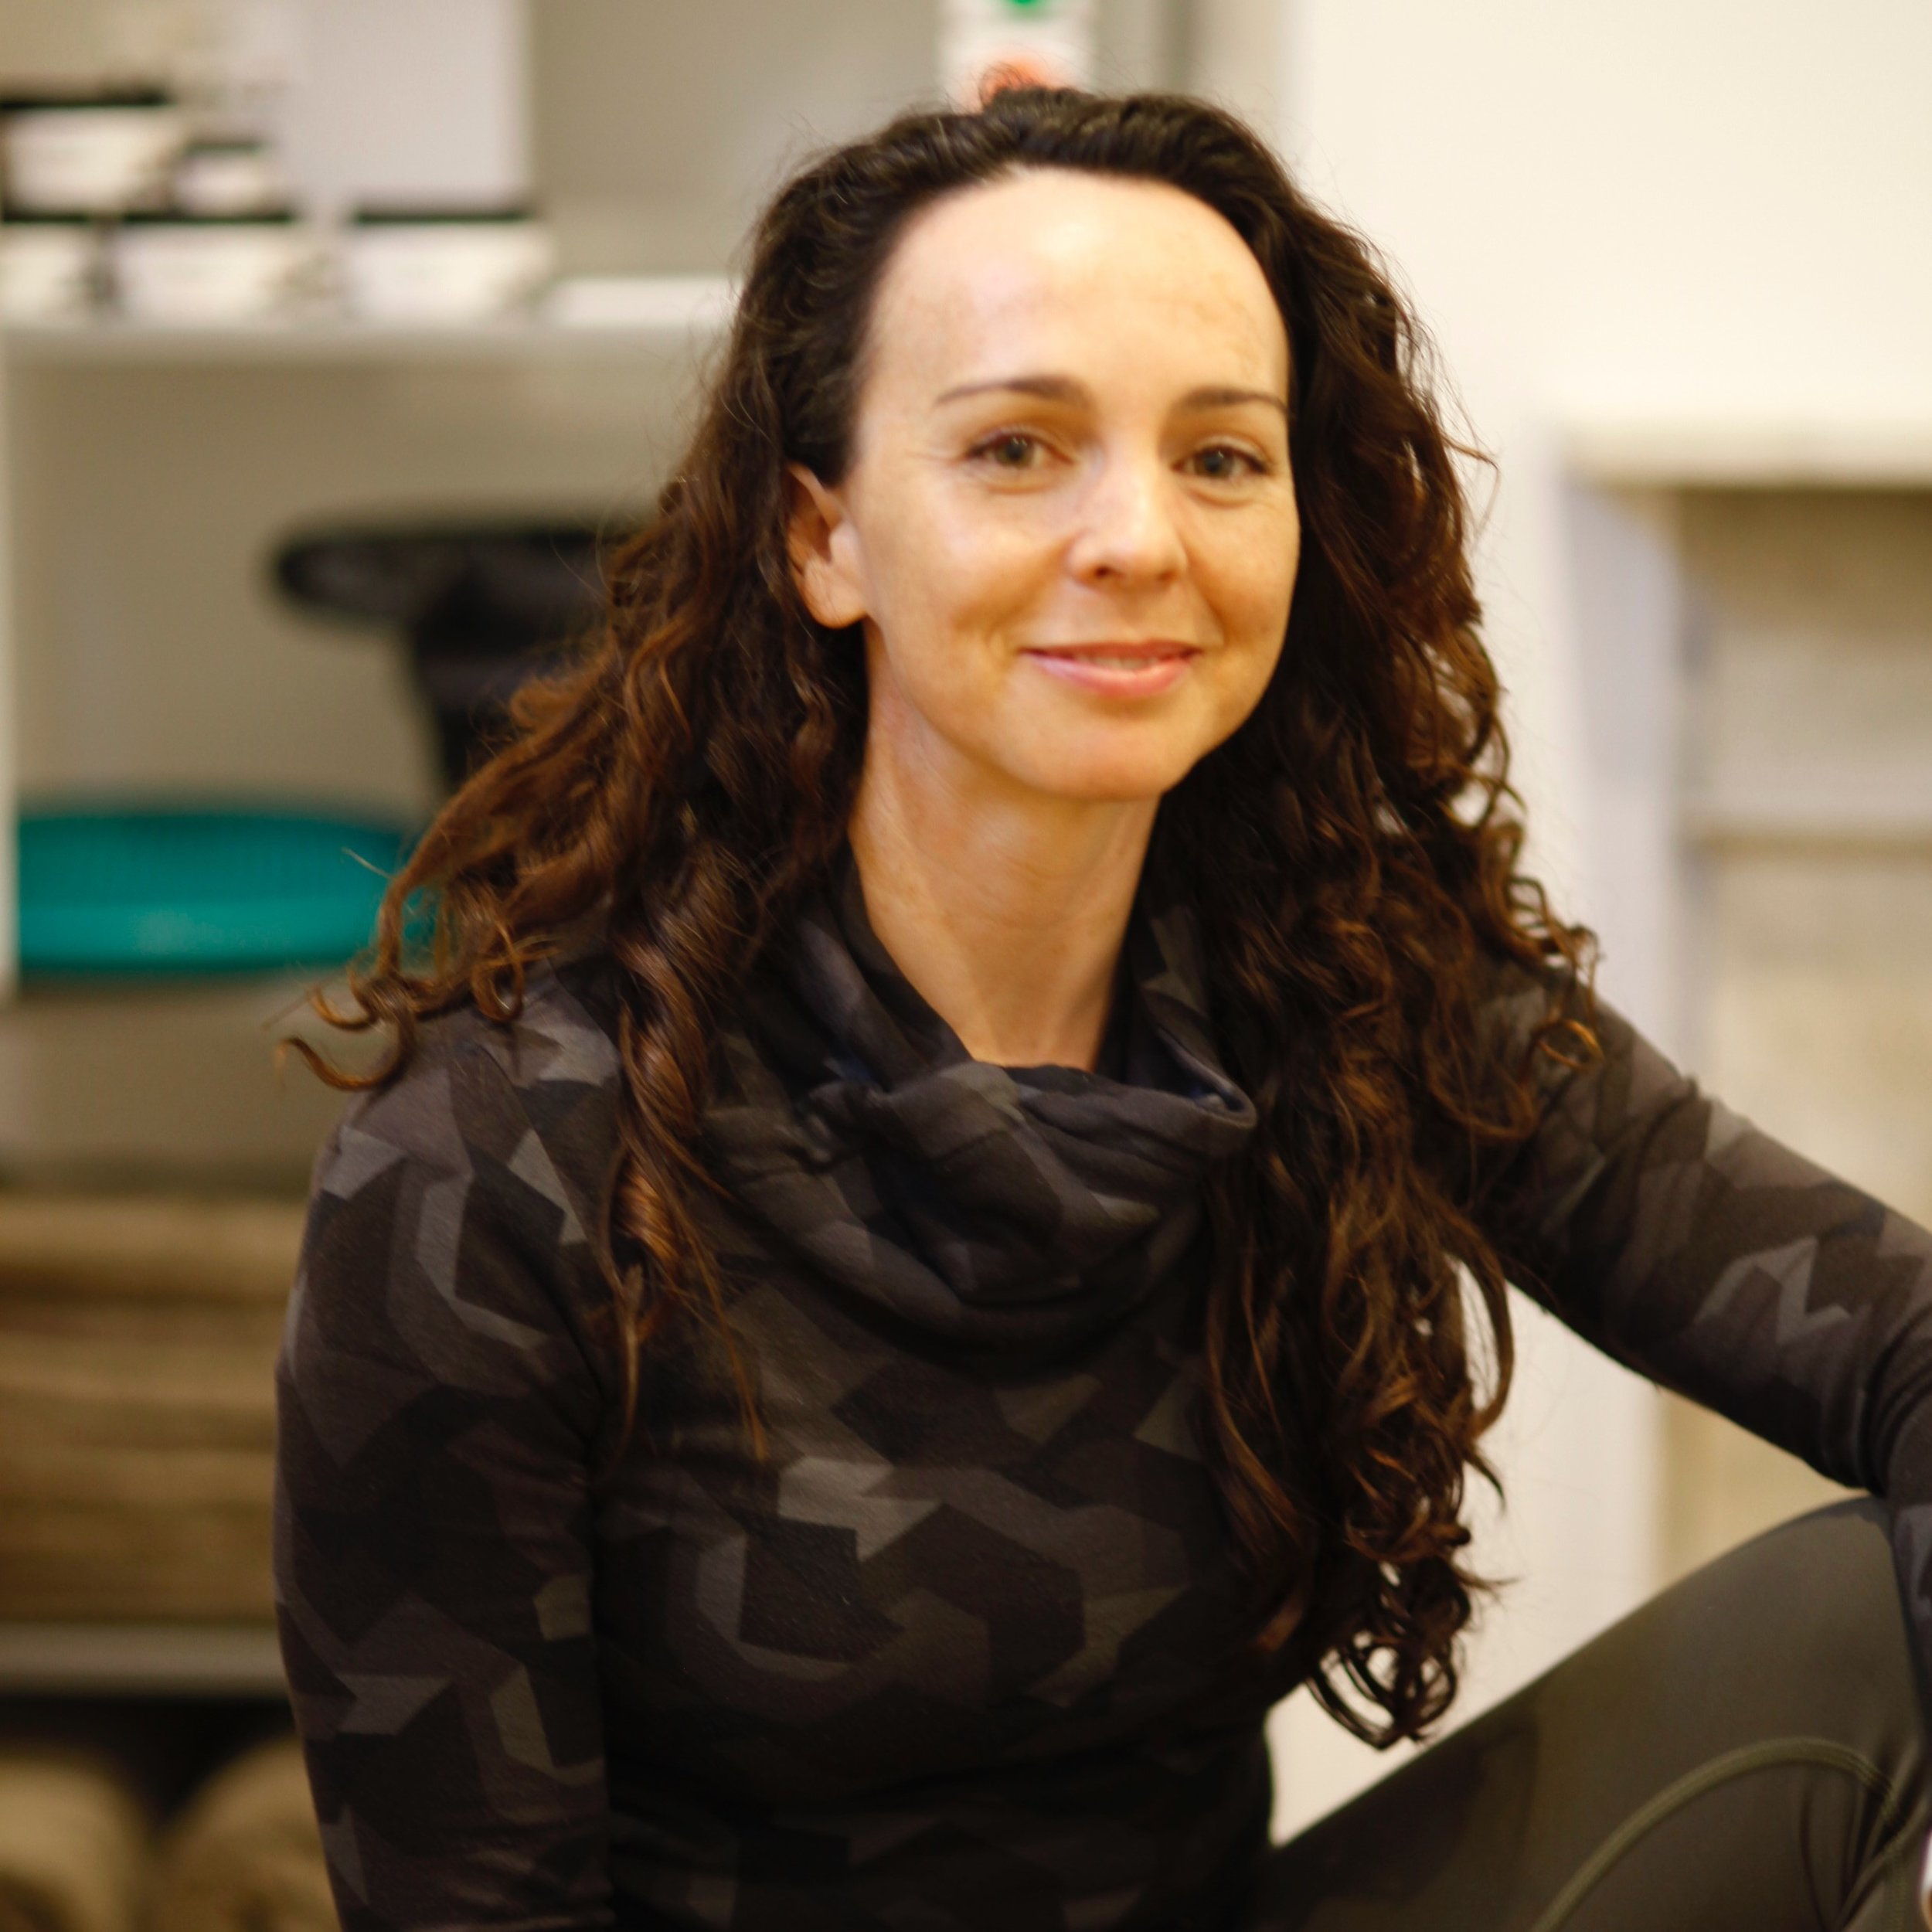 Laura Kavanagh